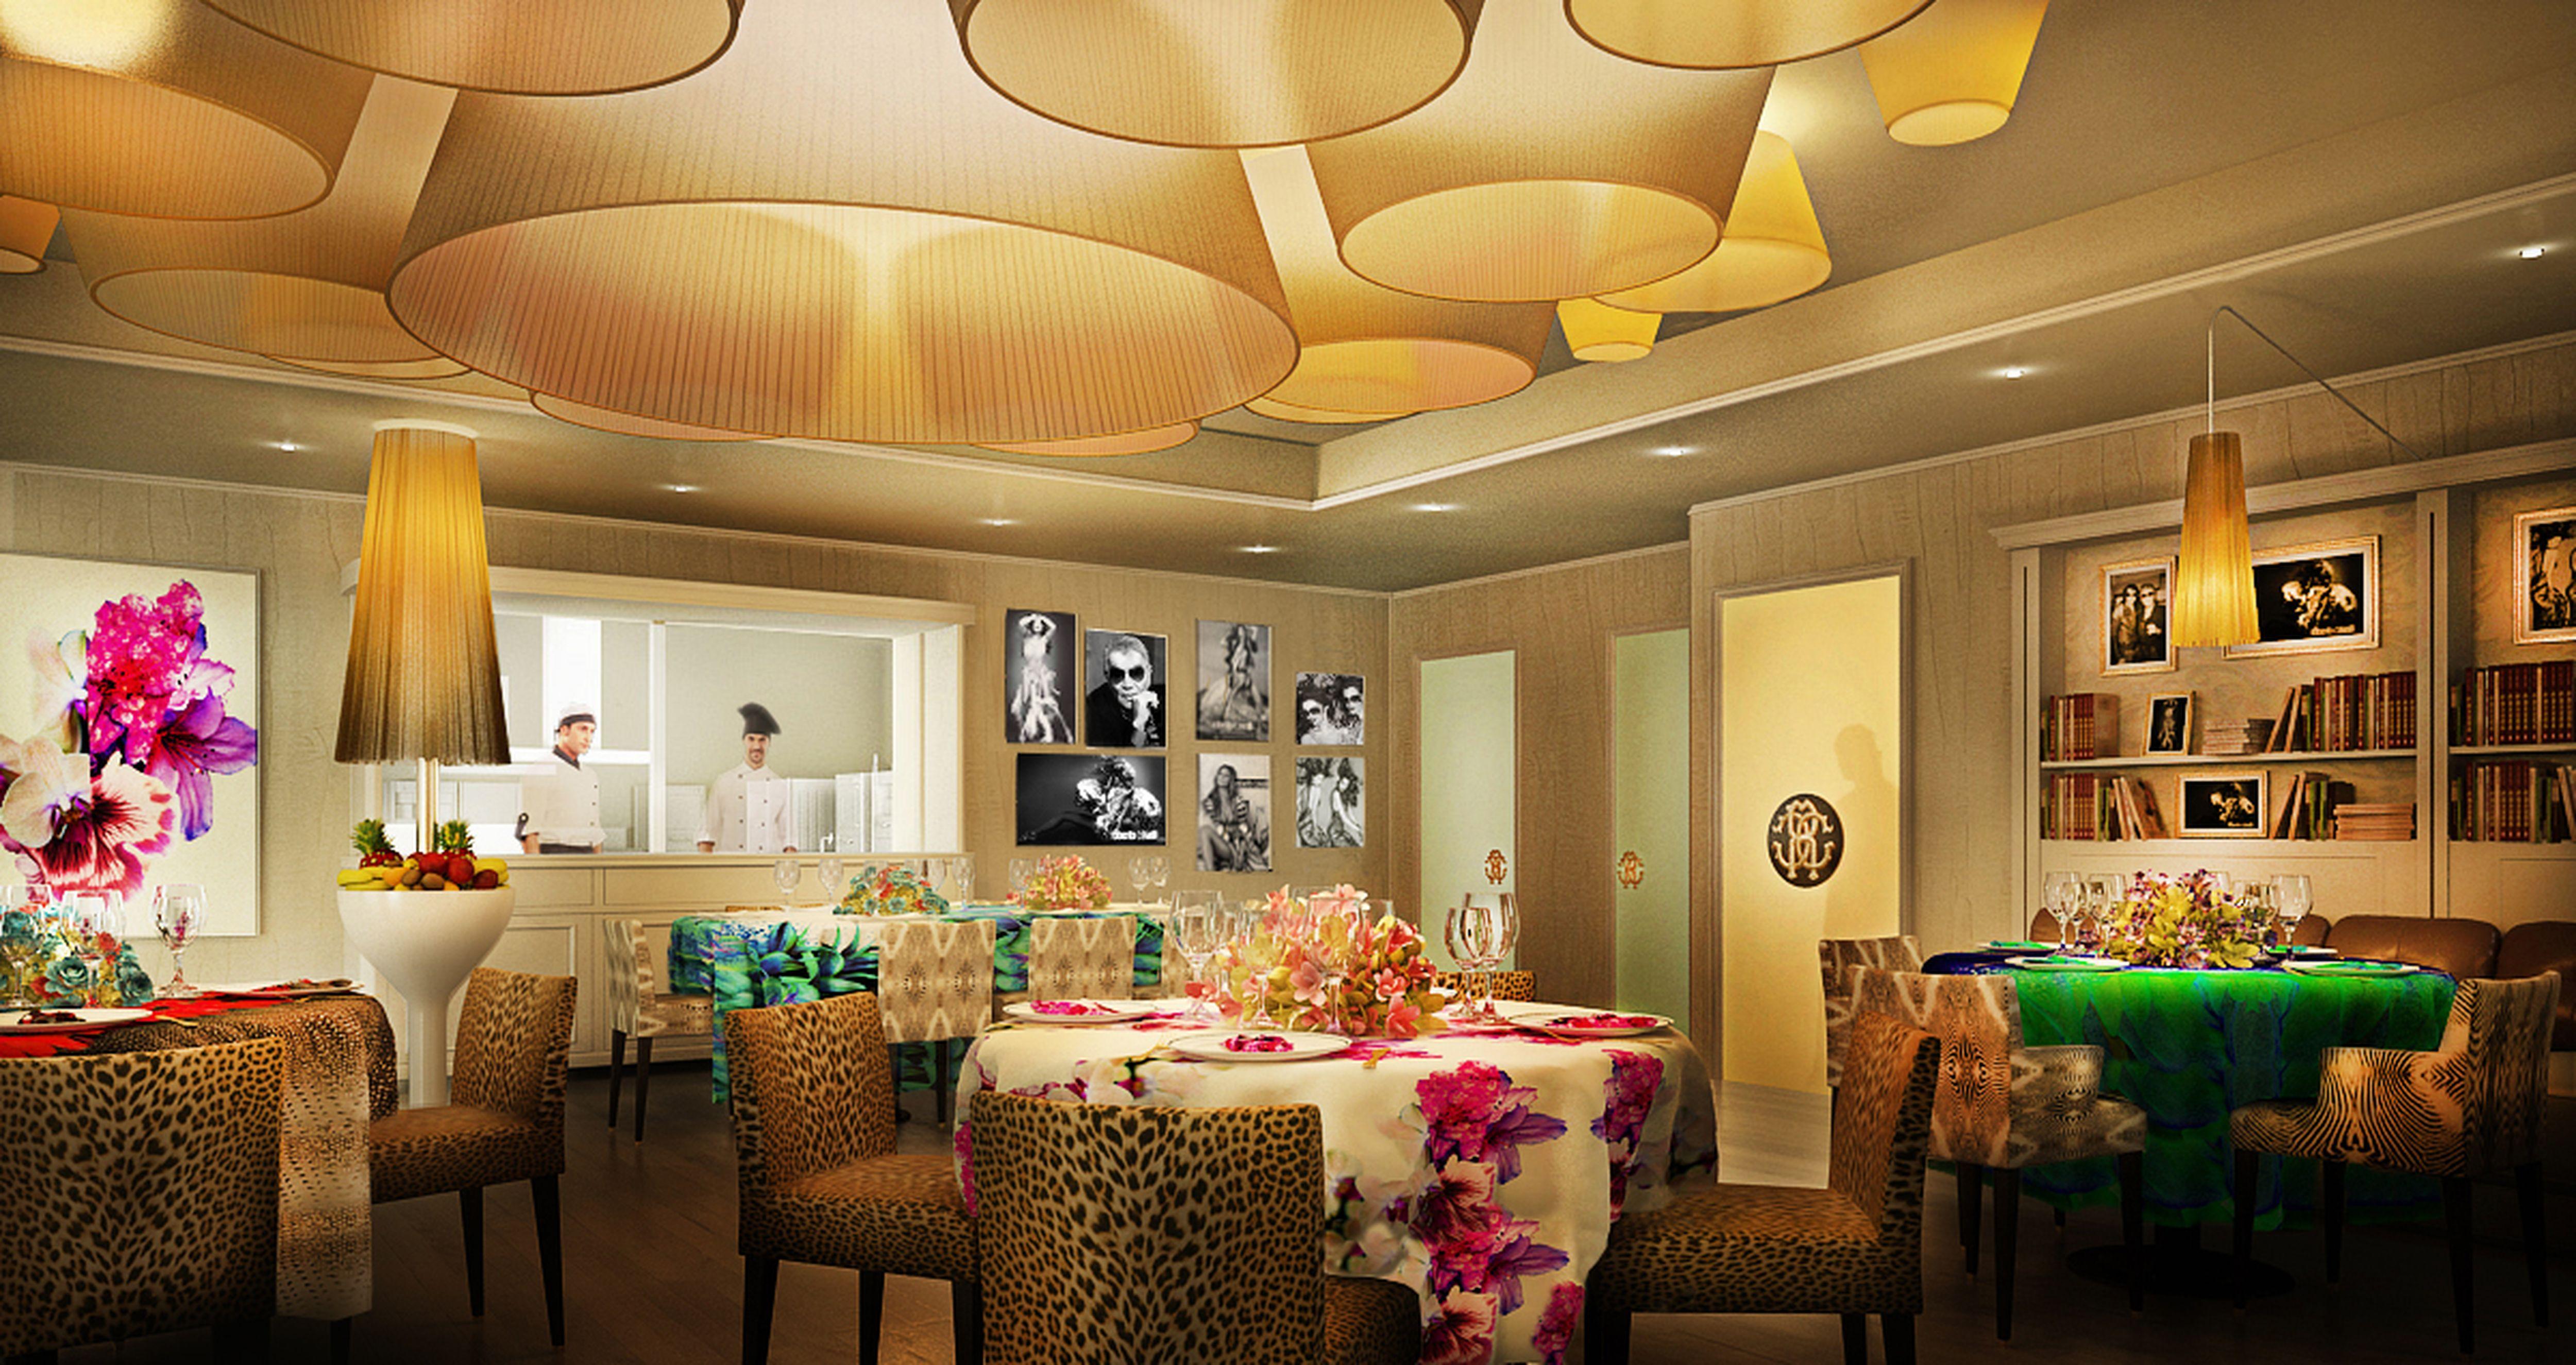 Inside the 'Cavalli Restaurant & Lounge' in Miami Beach